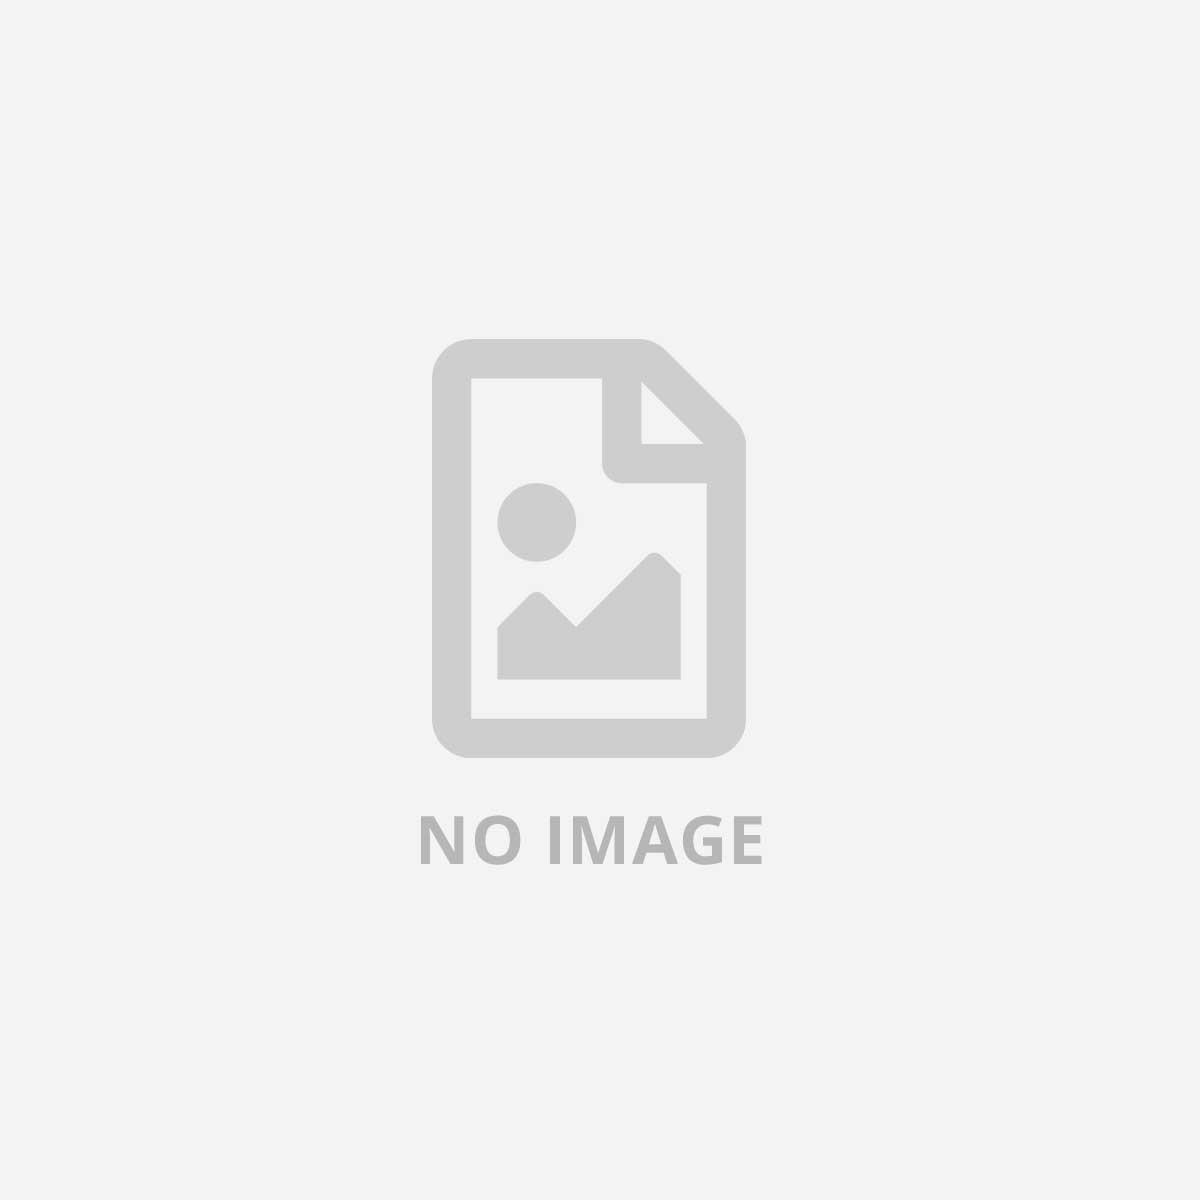 NILOX PCI EXPRESS 1 SERIAL PORT ADAPTER